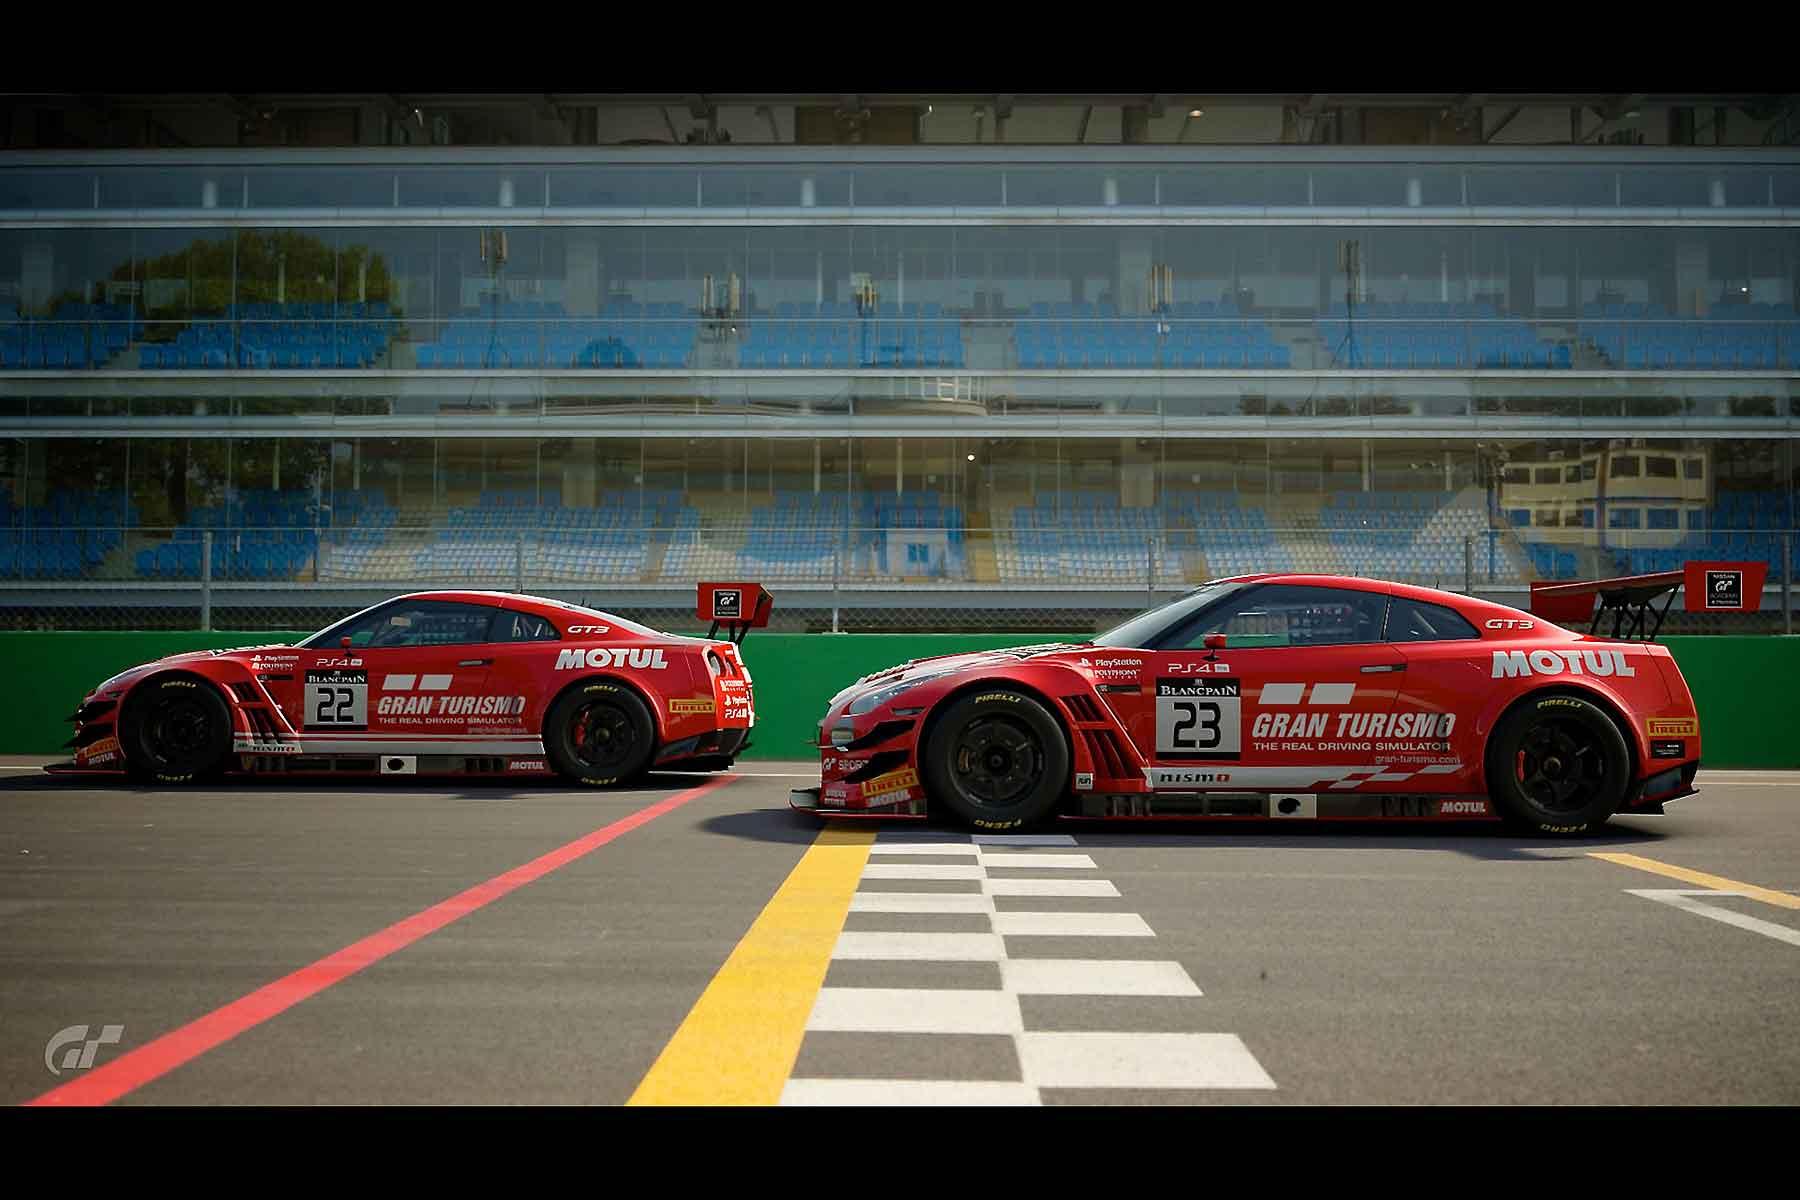 Nissan Gran Turismo gamers